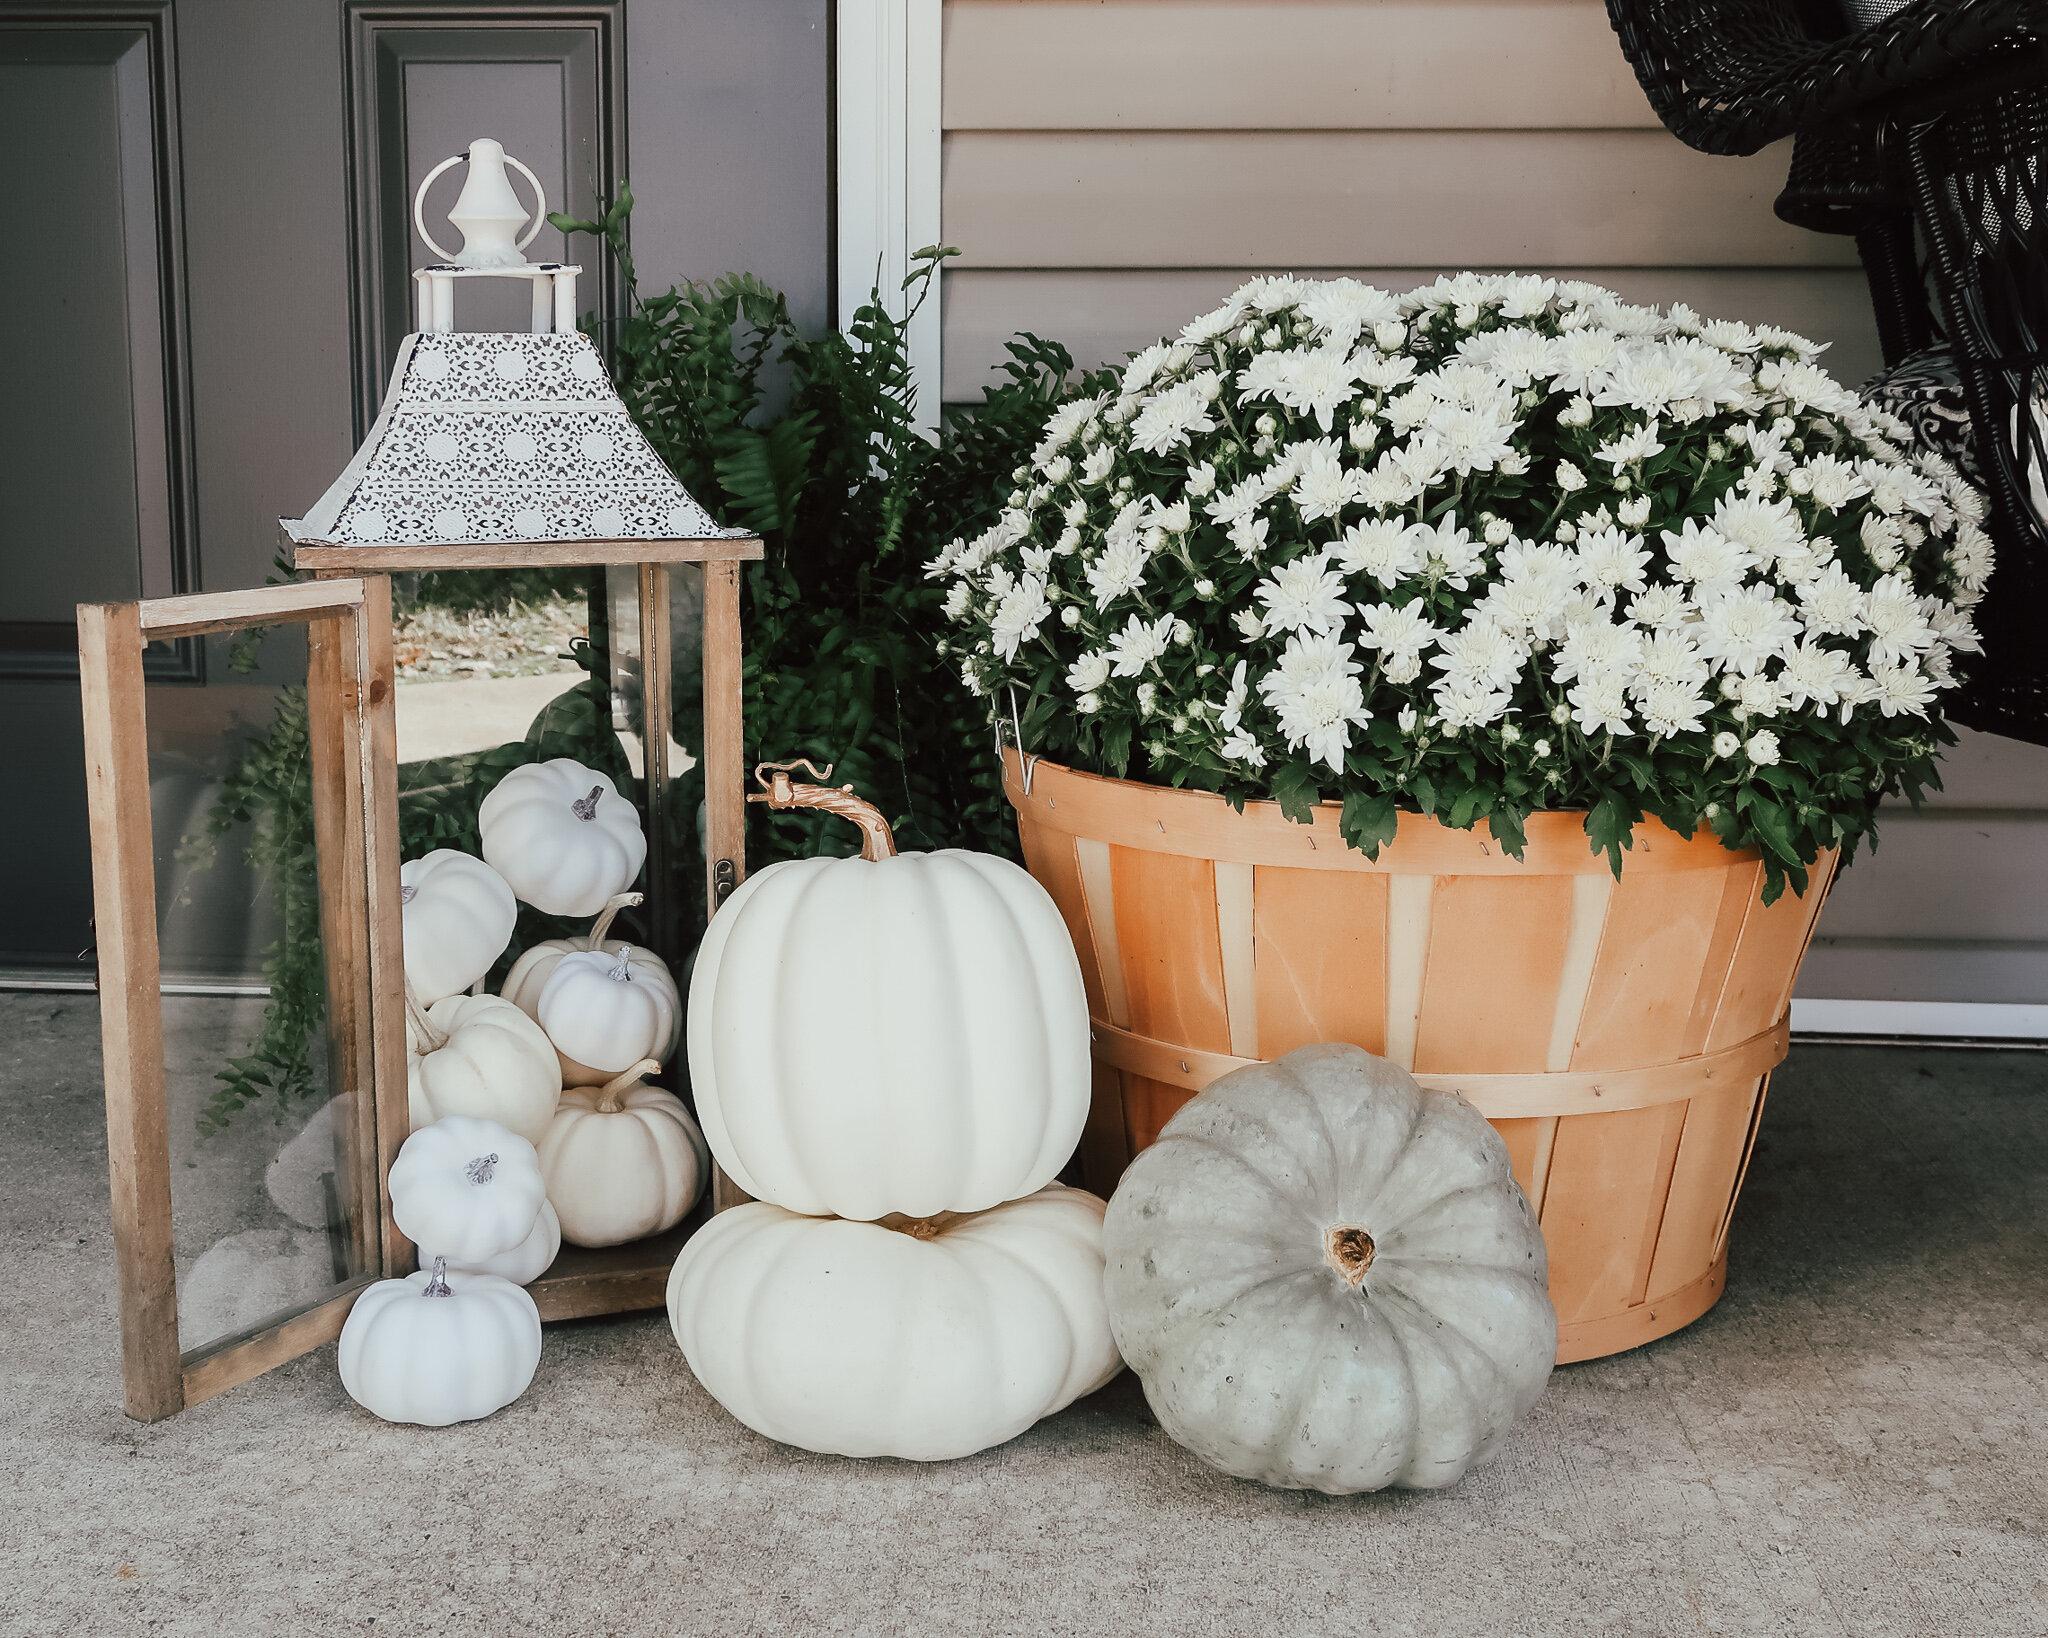 fall-front-porch-decor-11.jpg